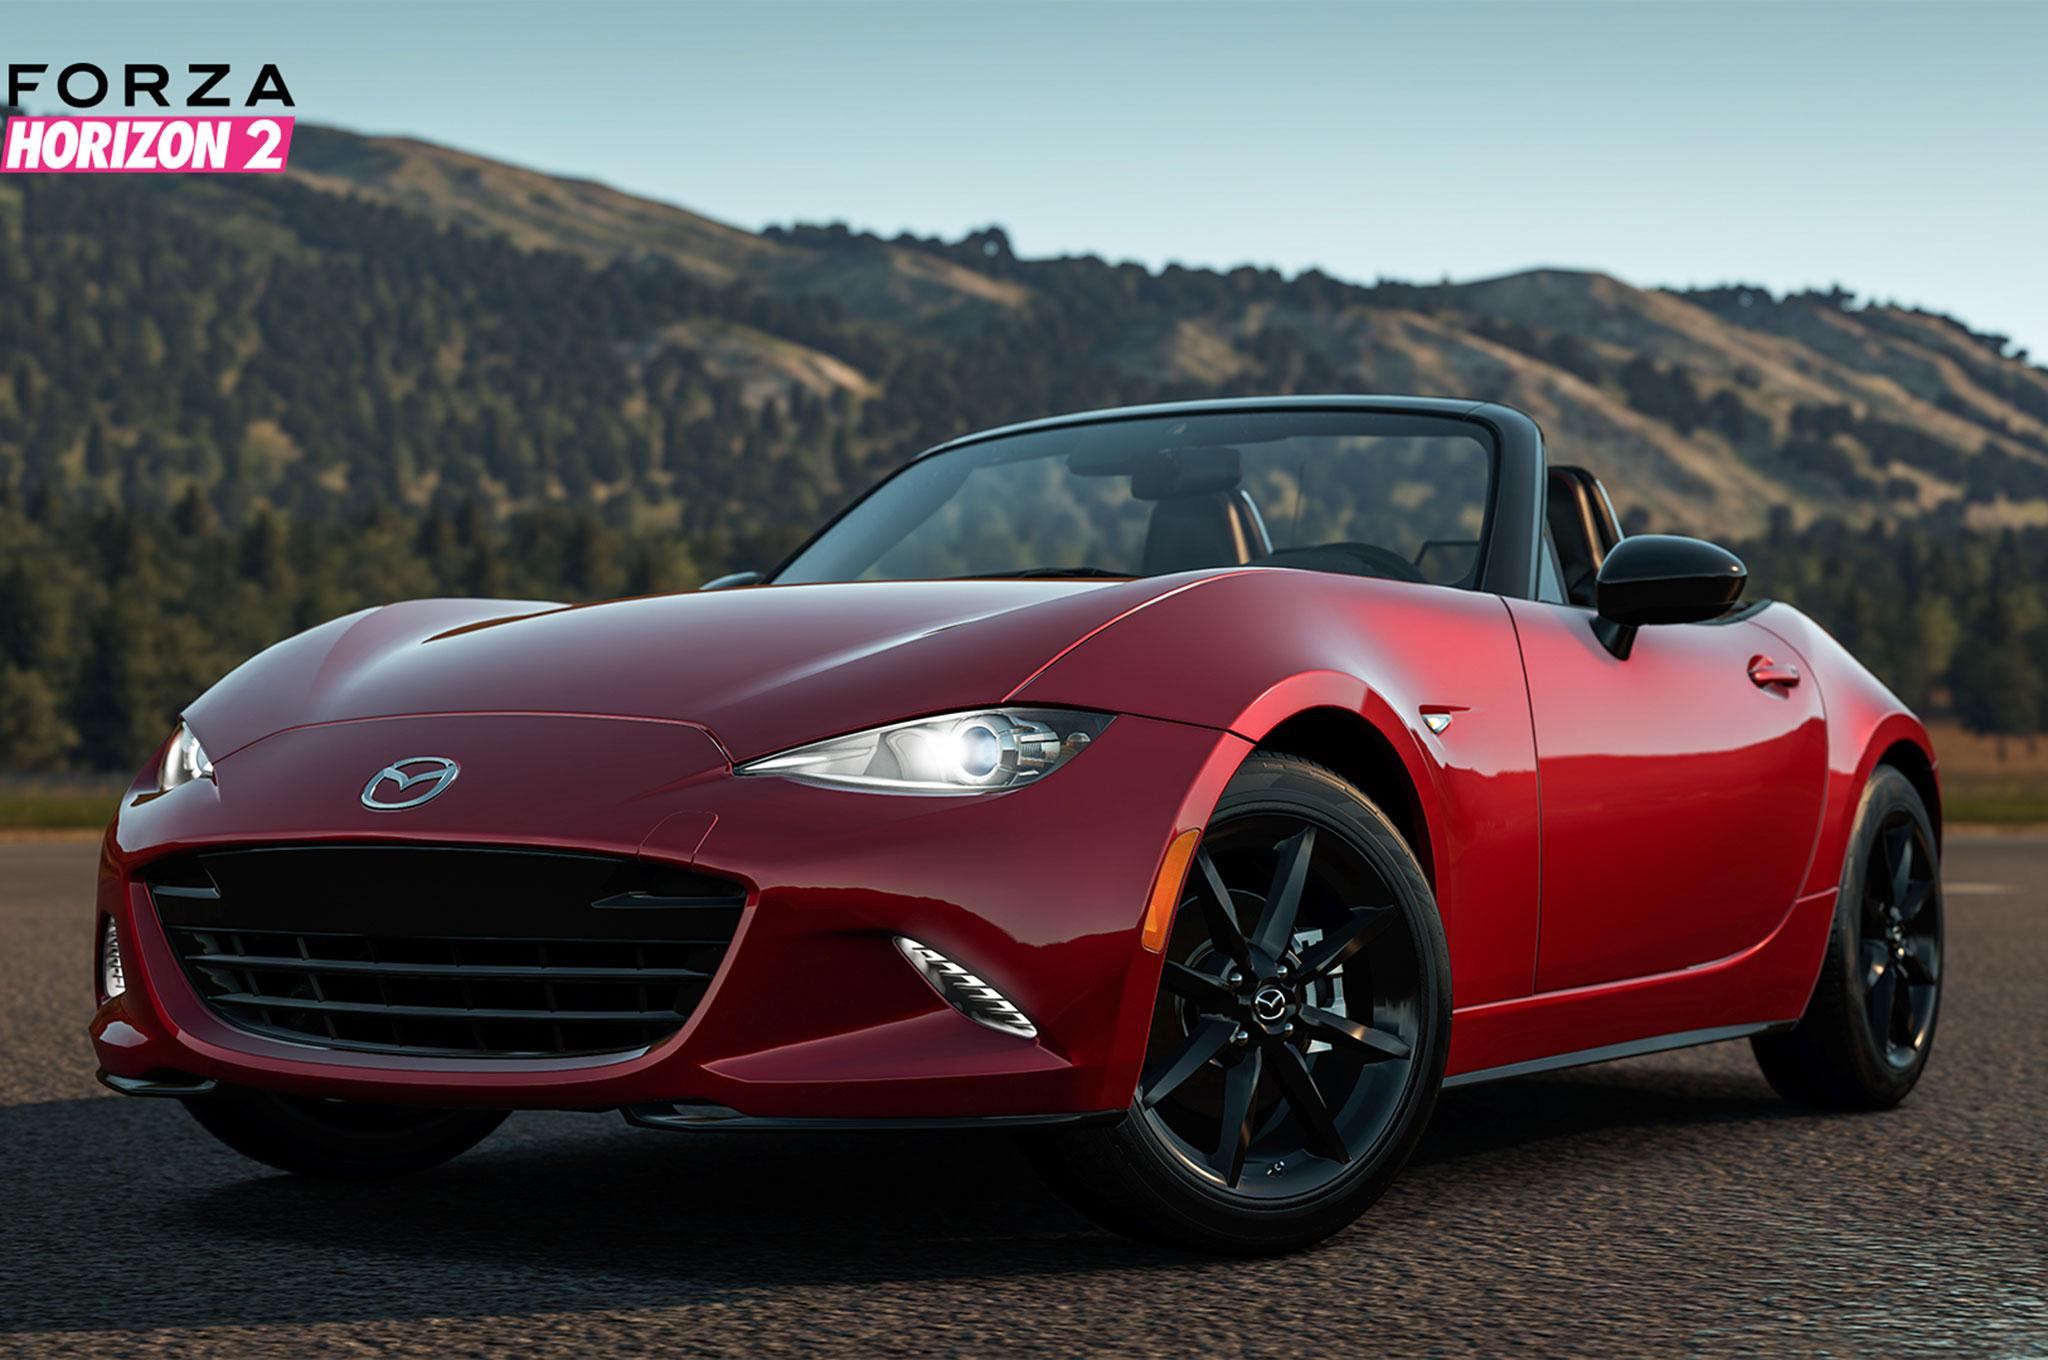 2016 Mazda Mx 5 Miata In Forza Horizon 2 Front Three Quarter